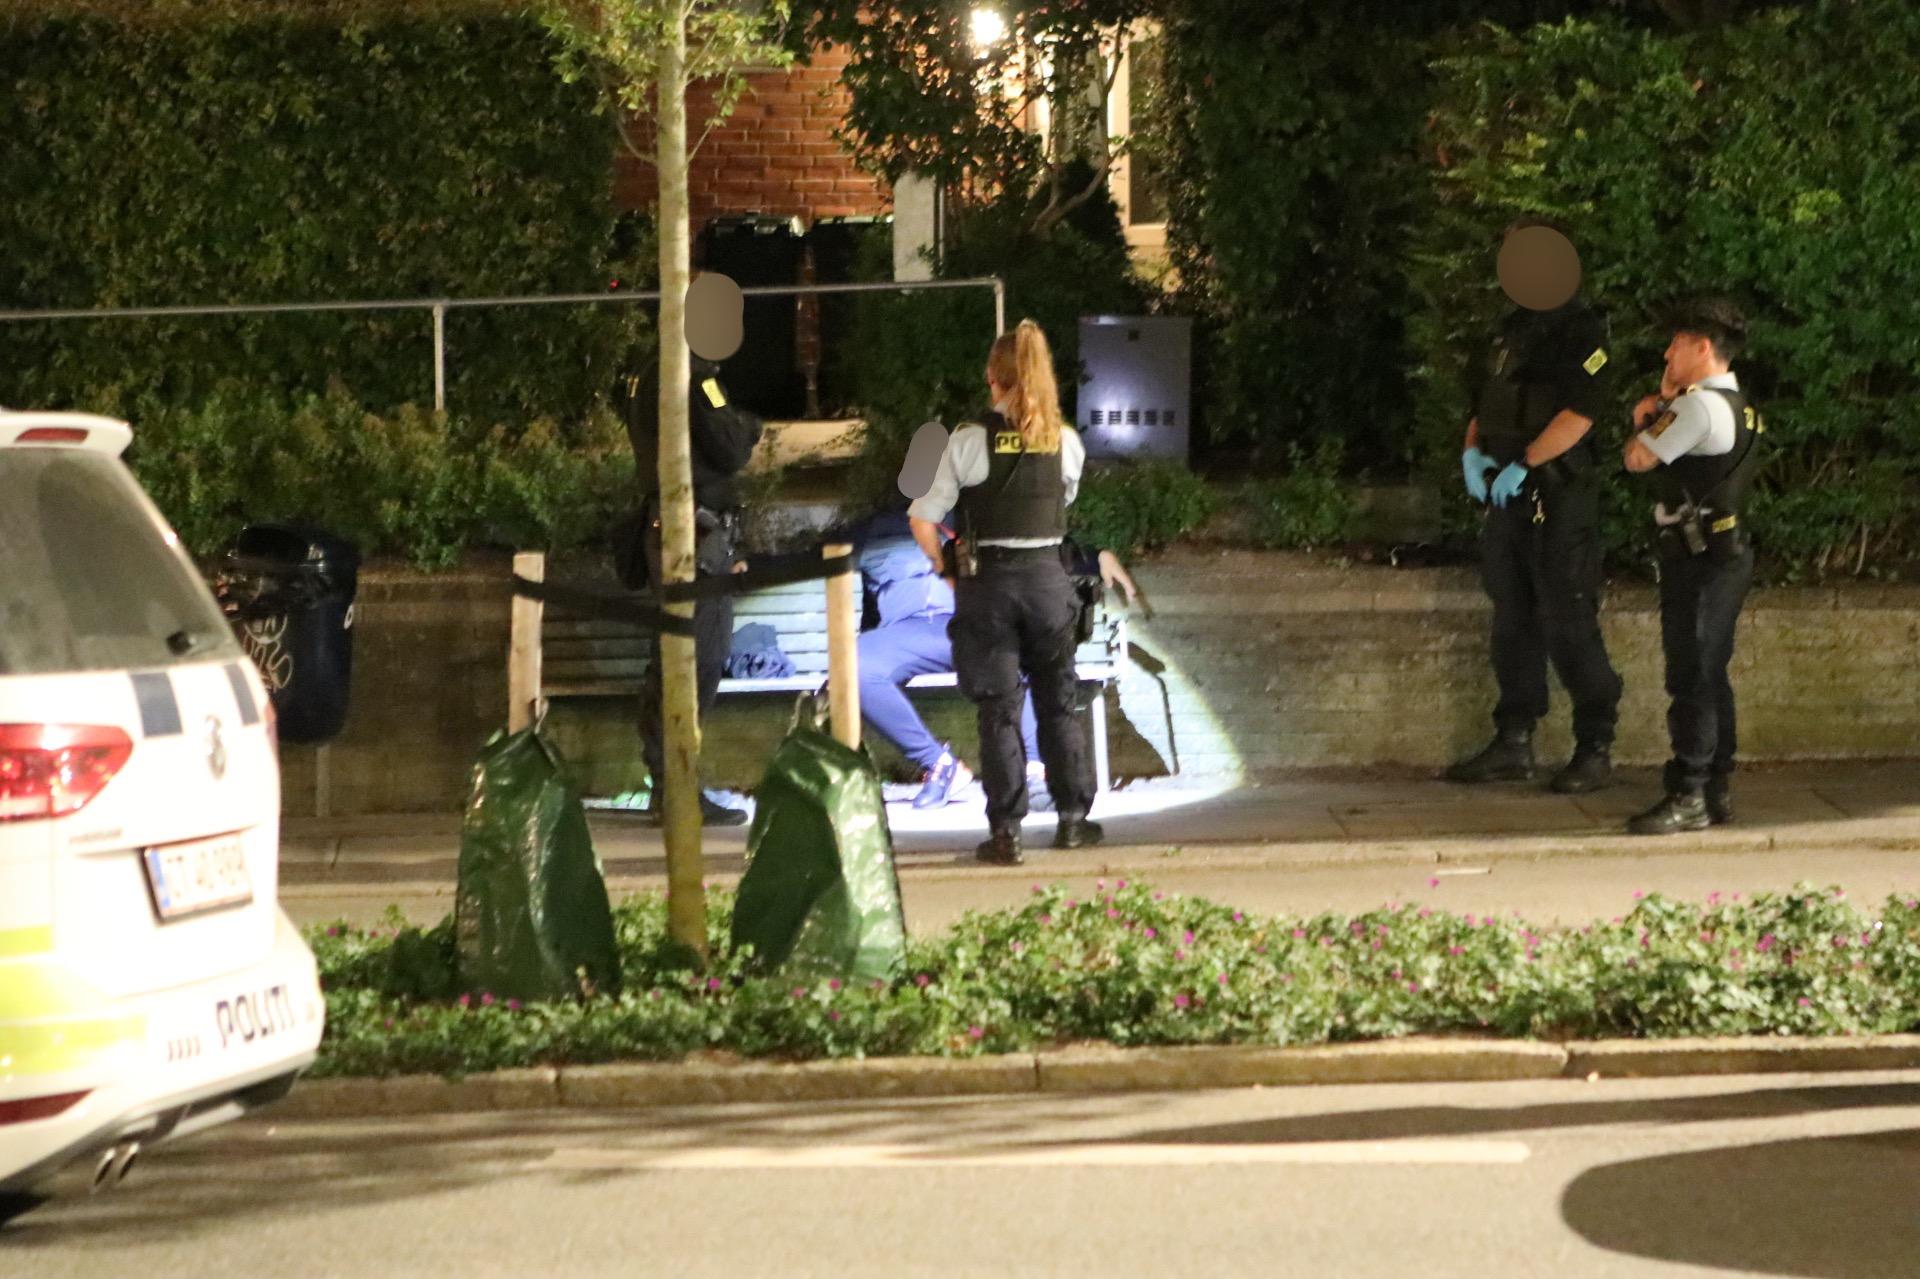 Pistol fundet - flere anholdte